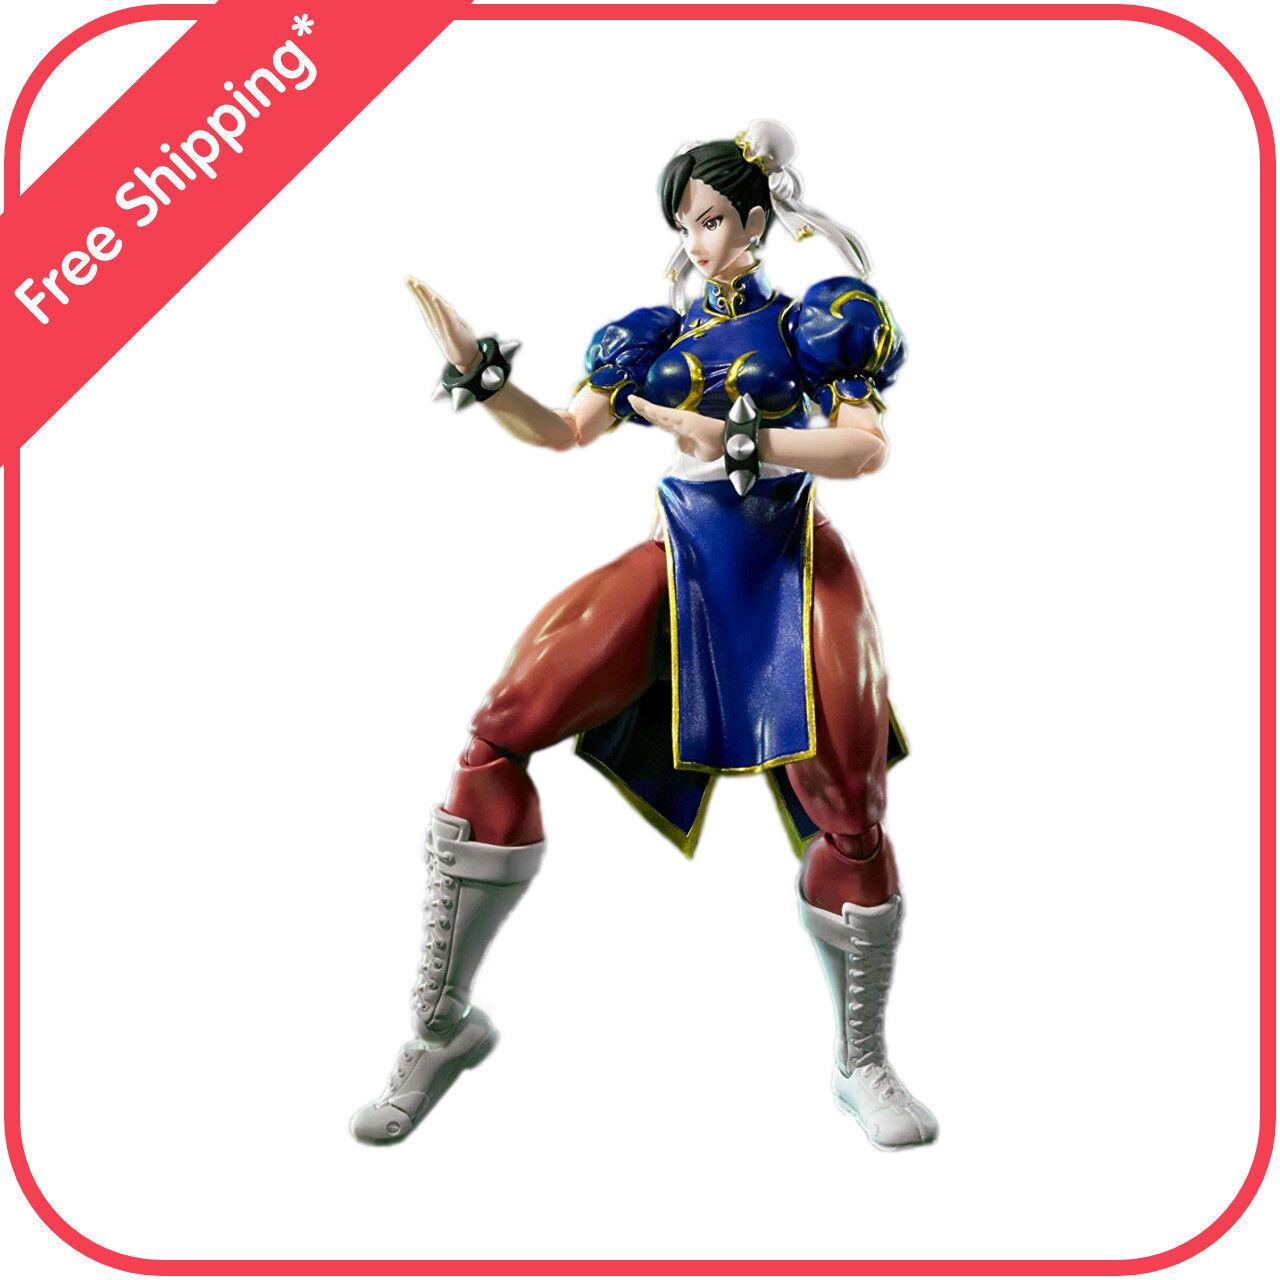 Bandai Chun Li de Street Fighter V Tamashii Nations de S.H. Figuarts